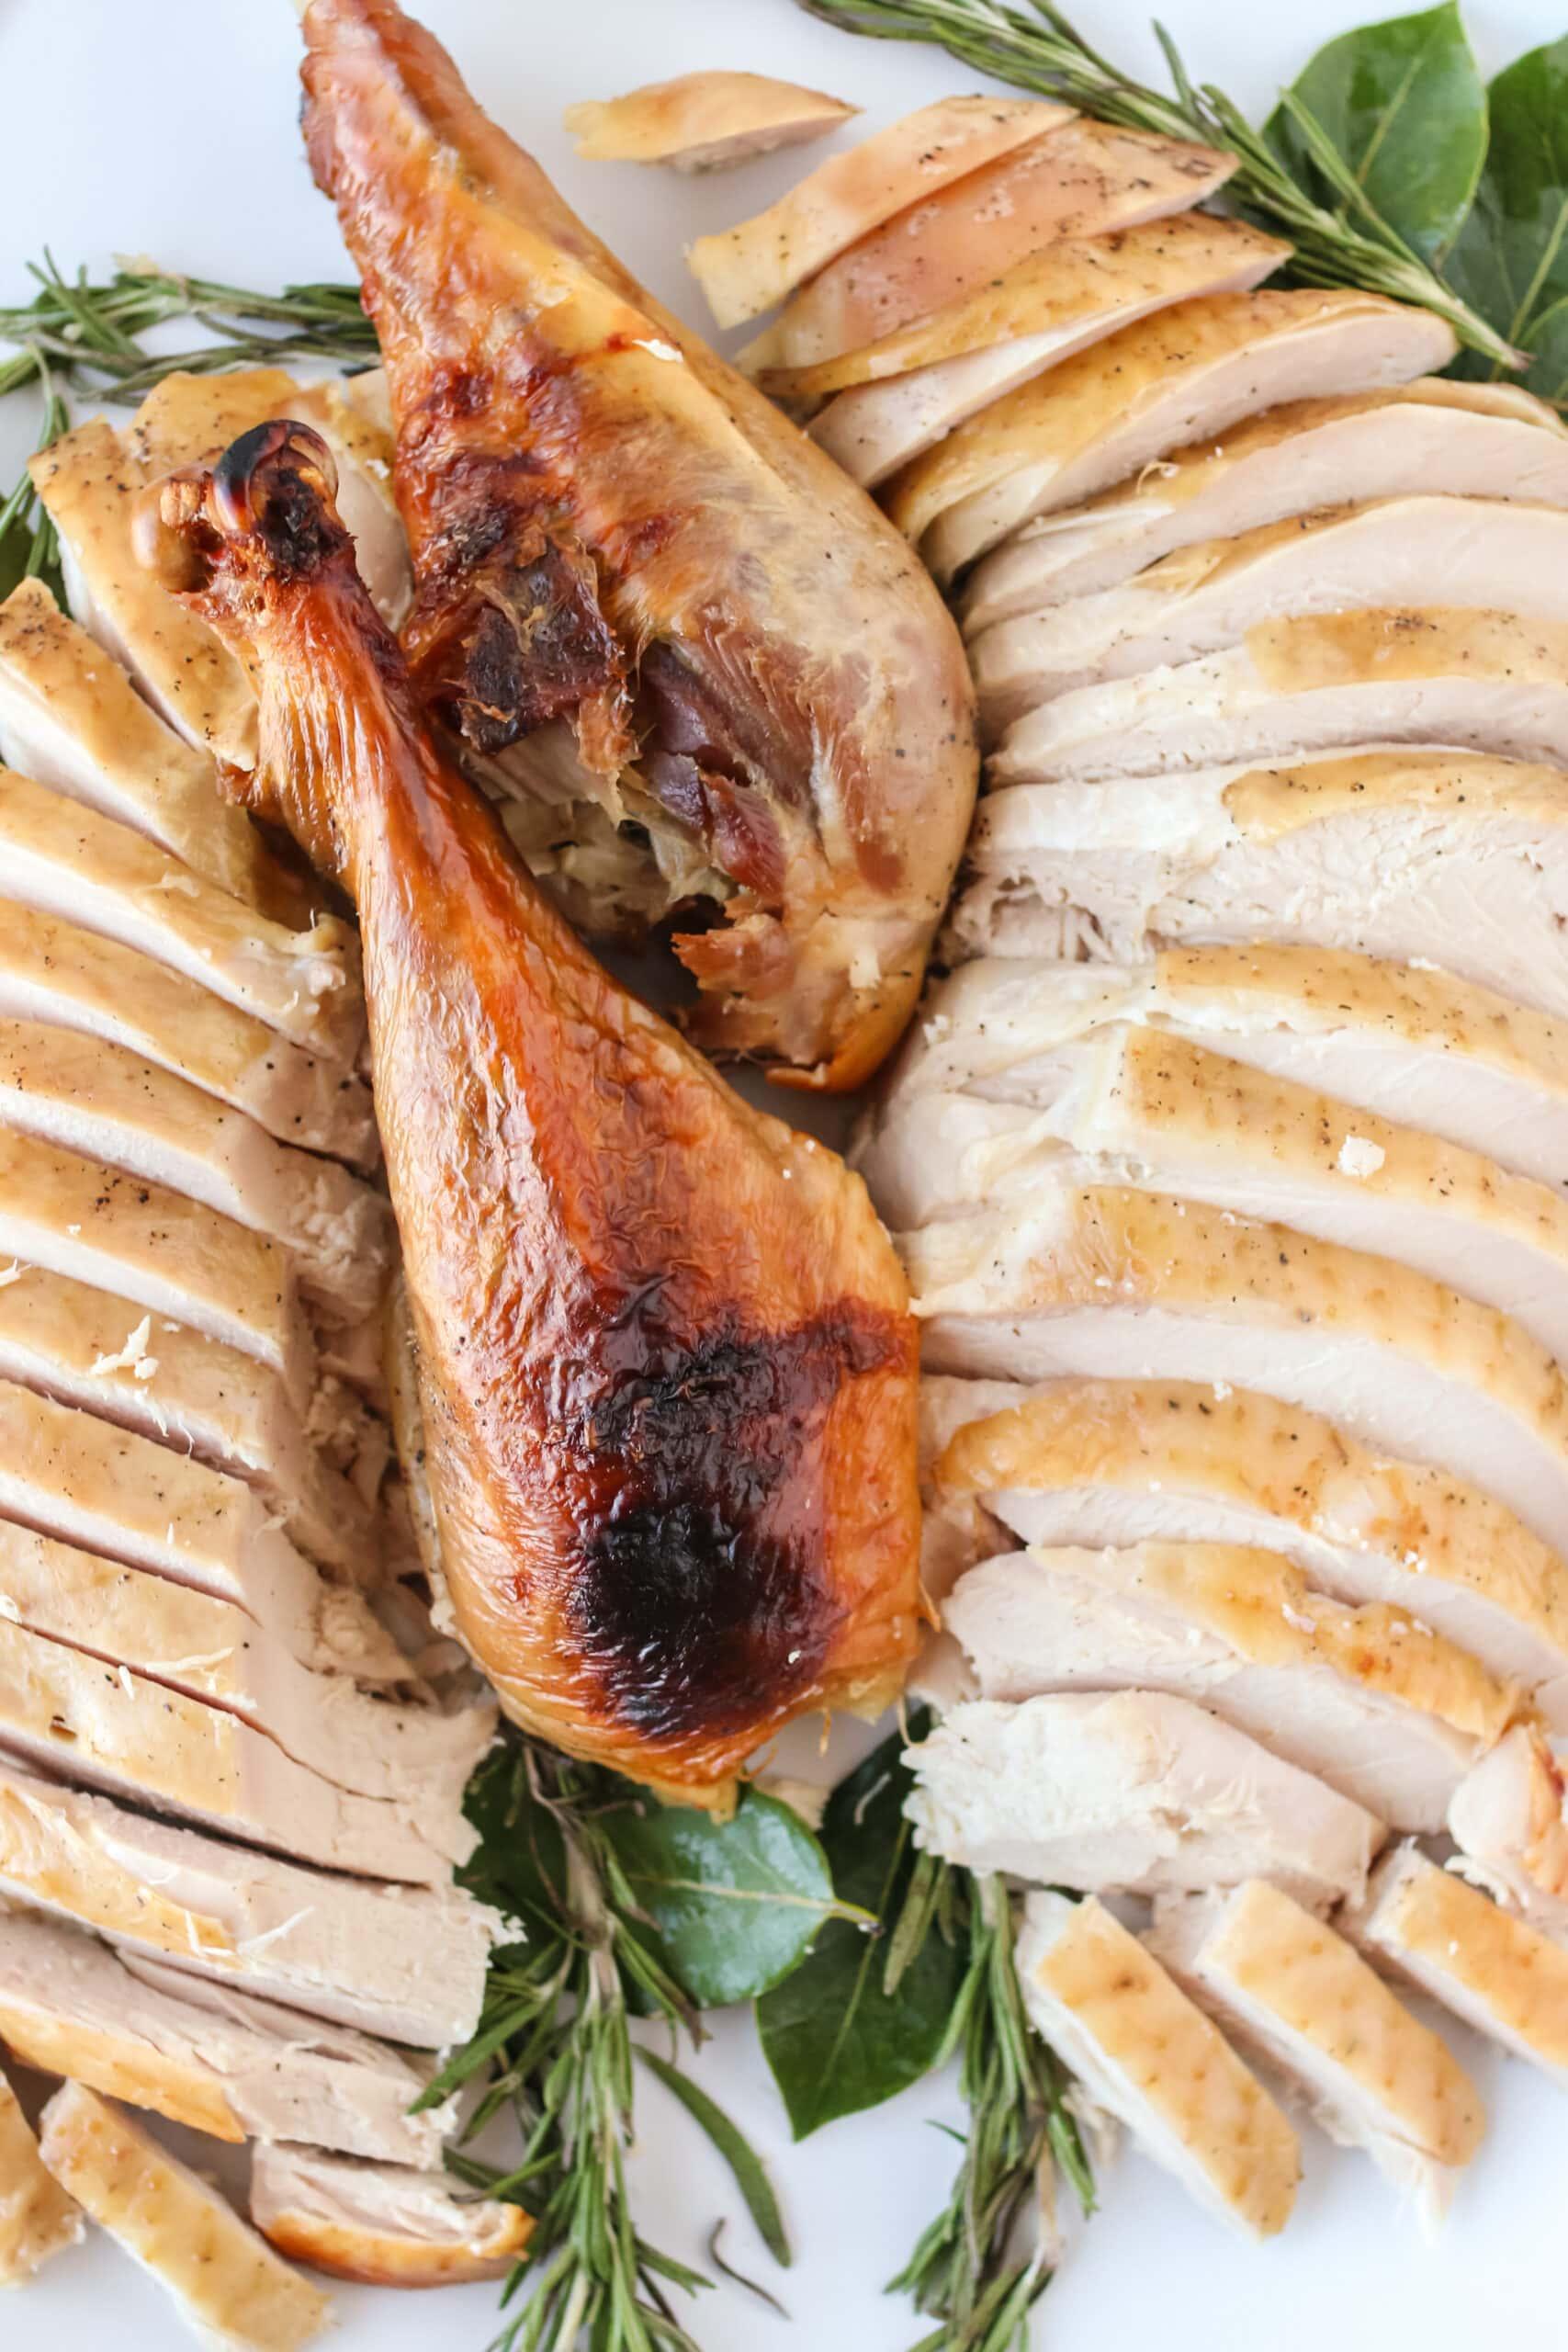 close up image of carved turkey on platter